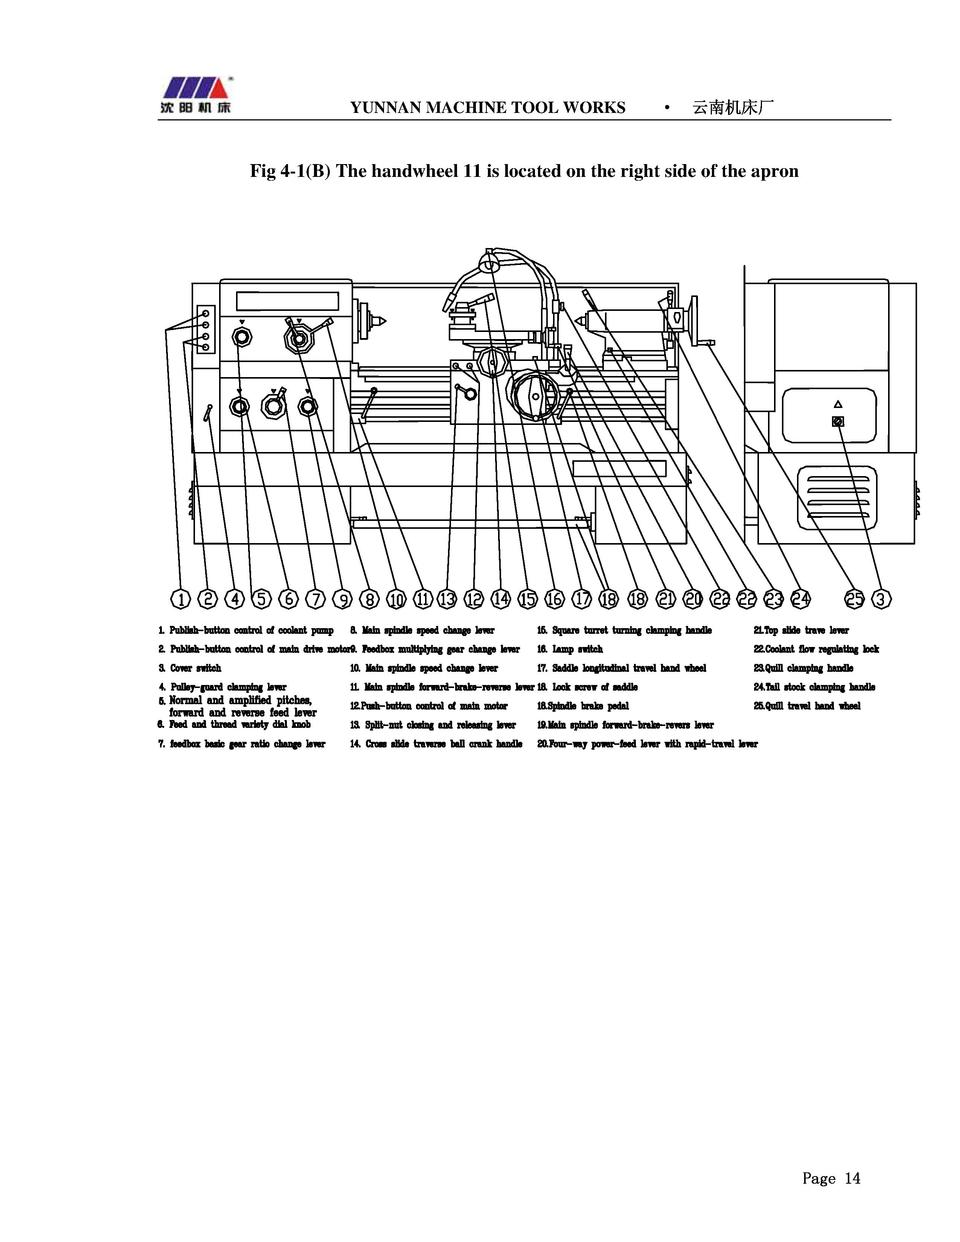 Manual Yunnan Cypml Lathe Pump Wiring Machine Tool Works Fig 4 1 B The Handwheel 11 Is Located On